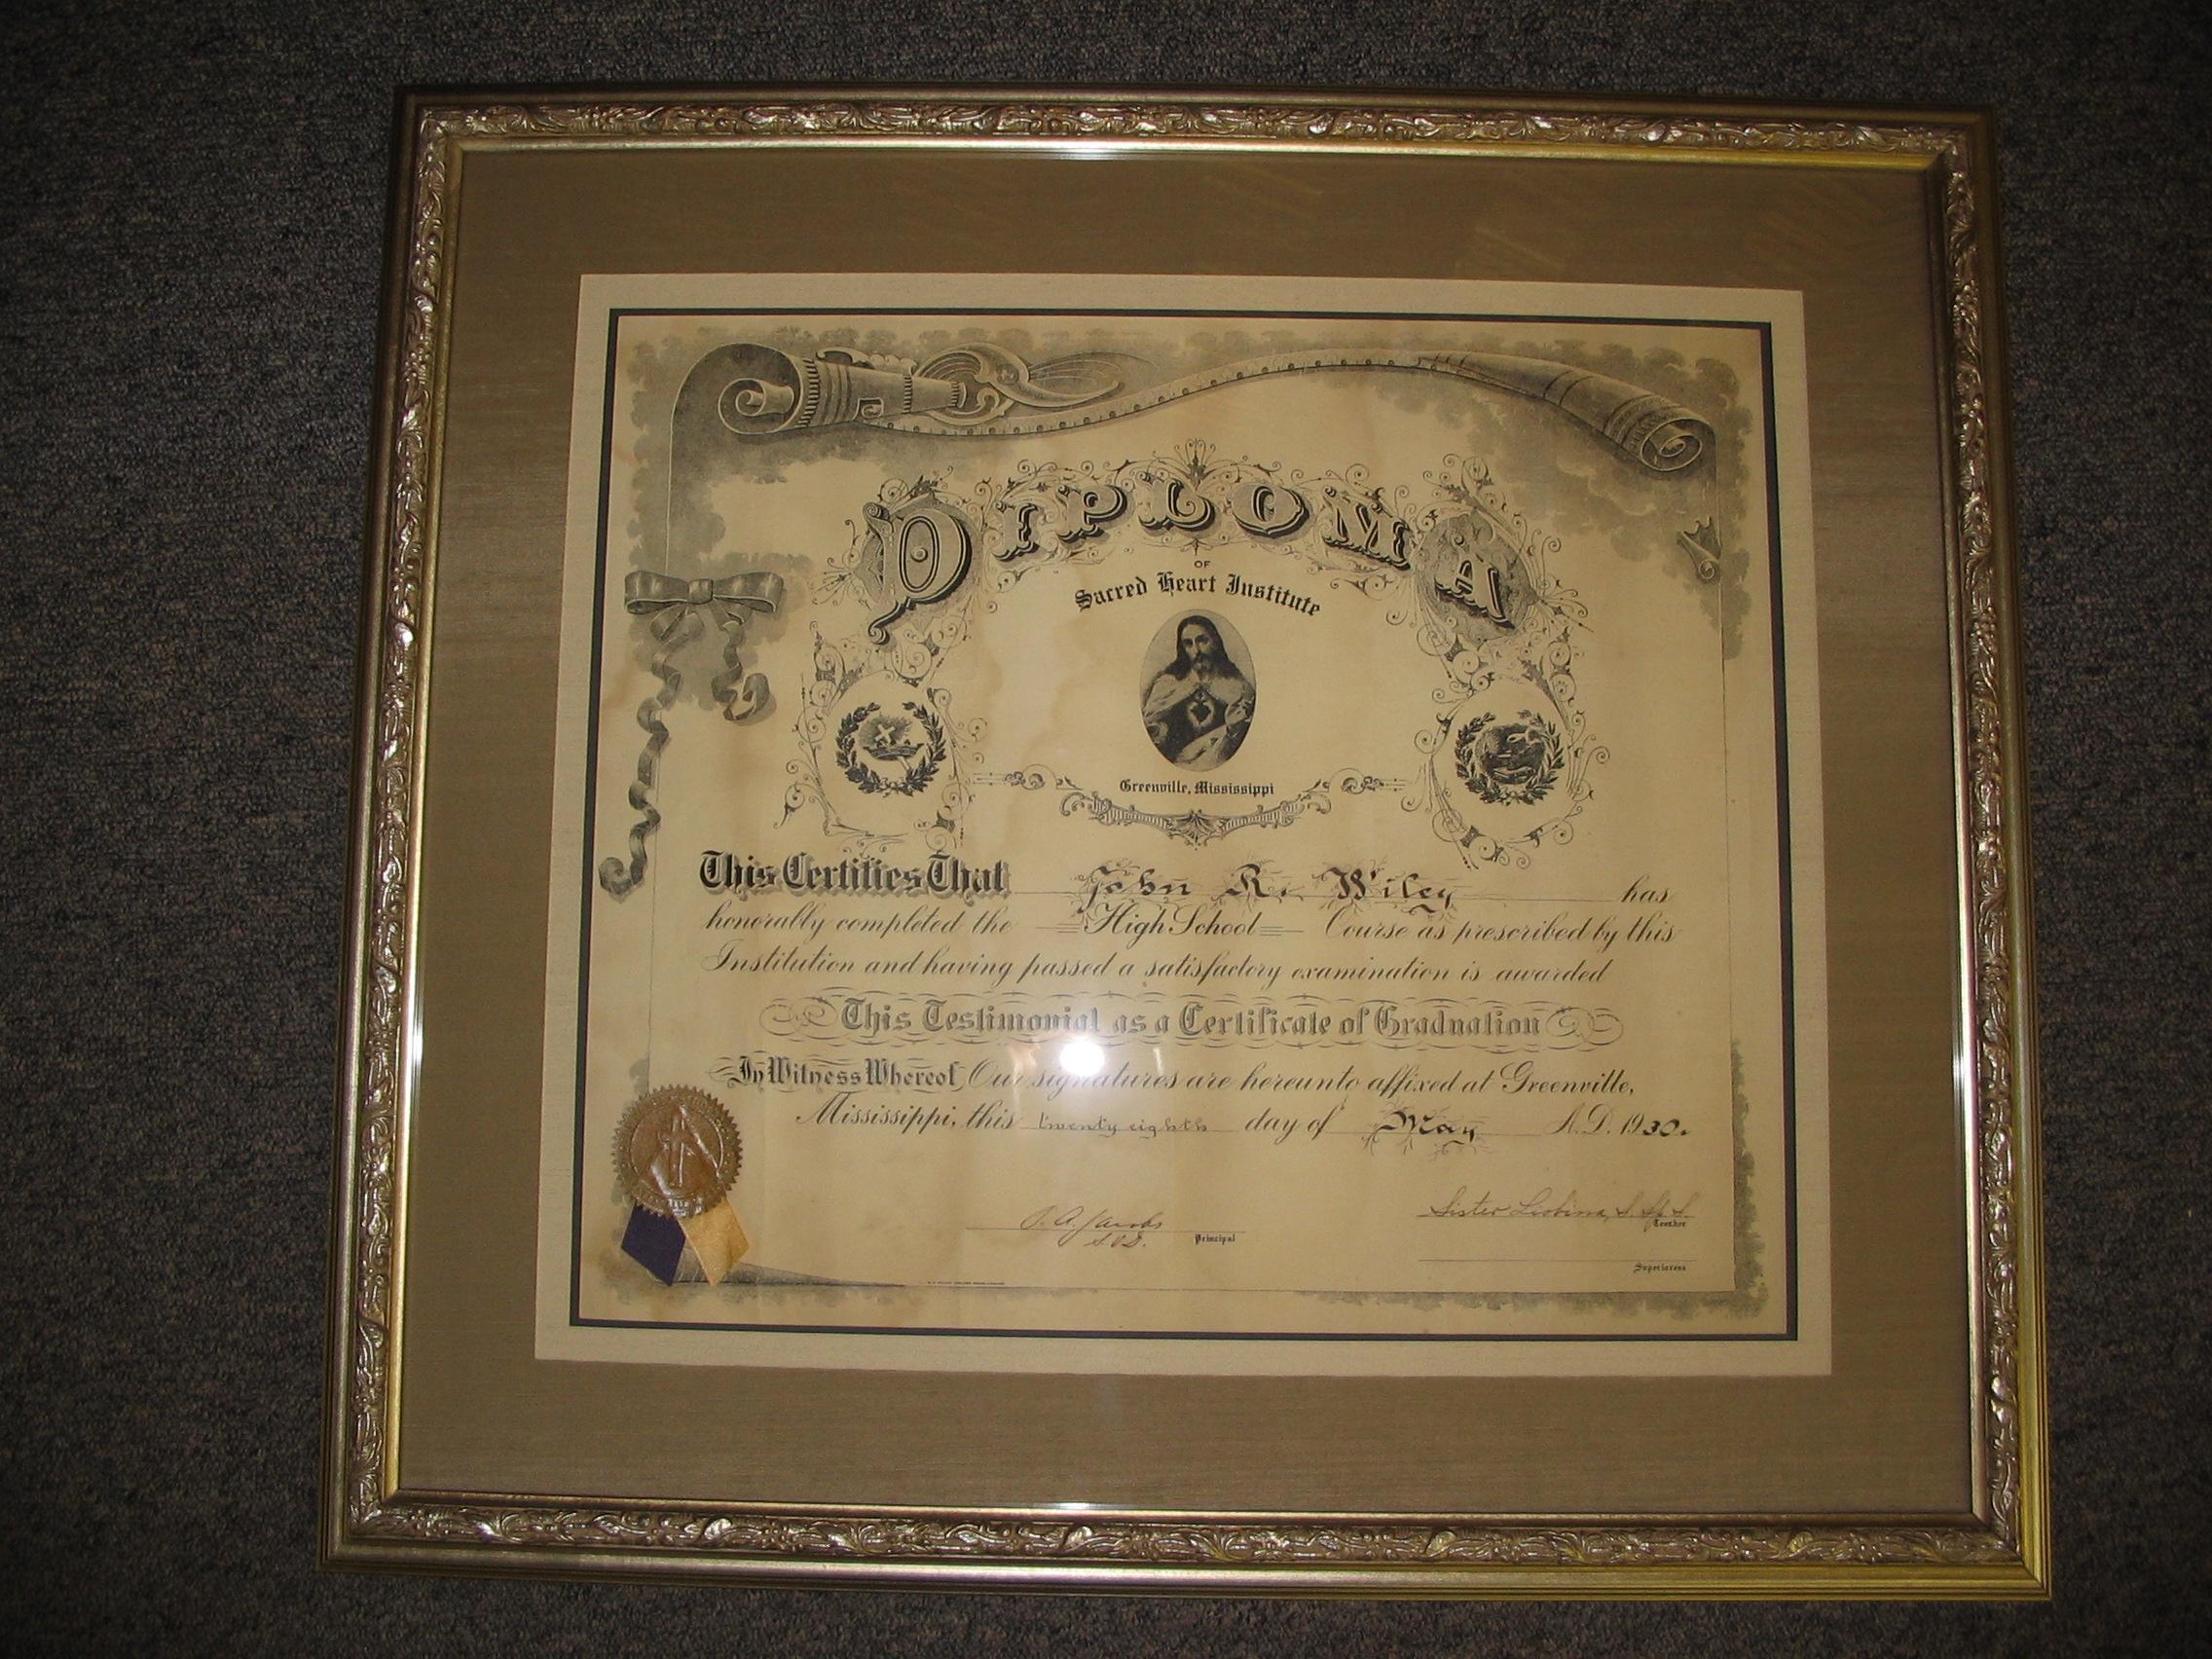 Diploma framed by The Framemakers